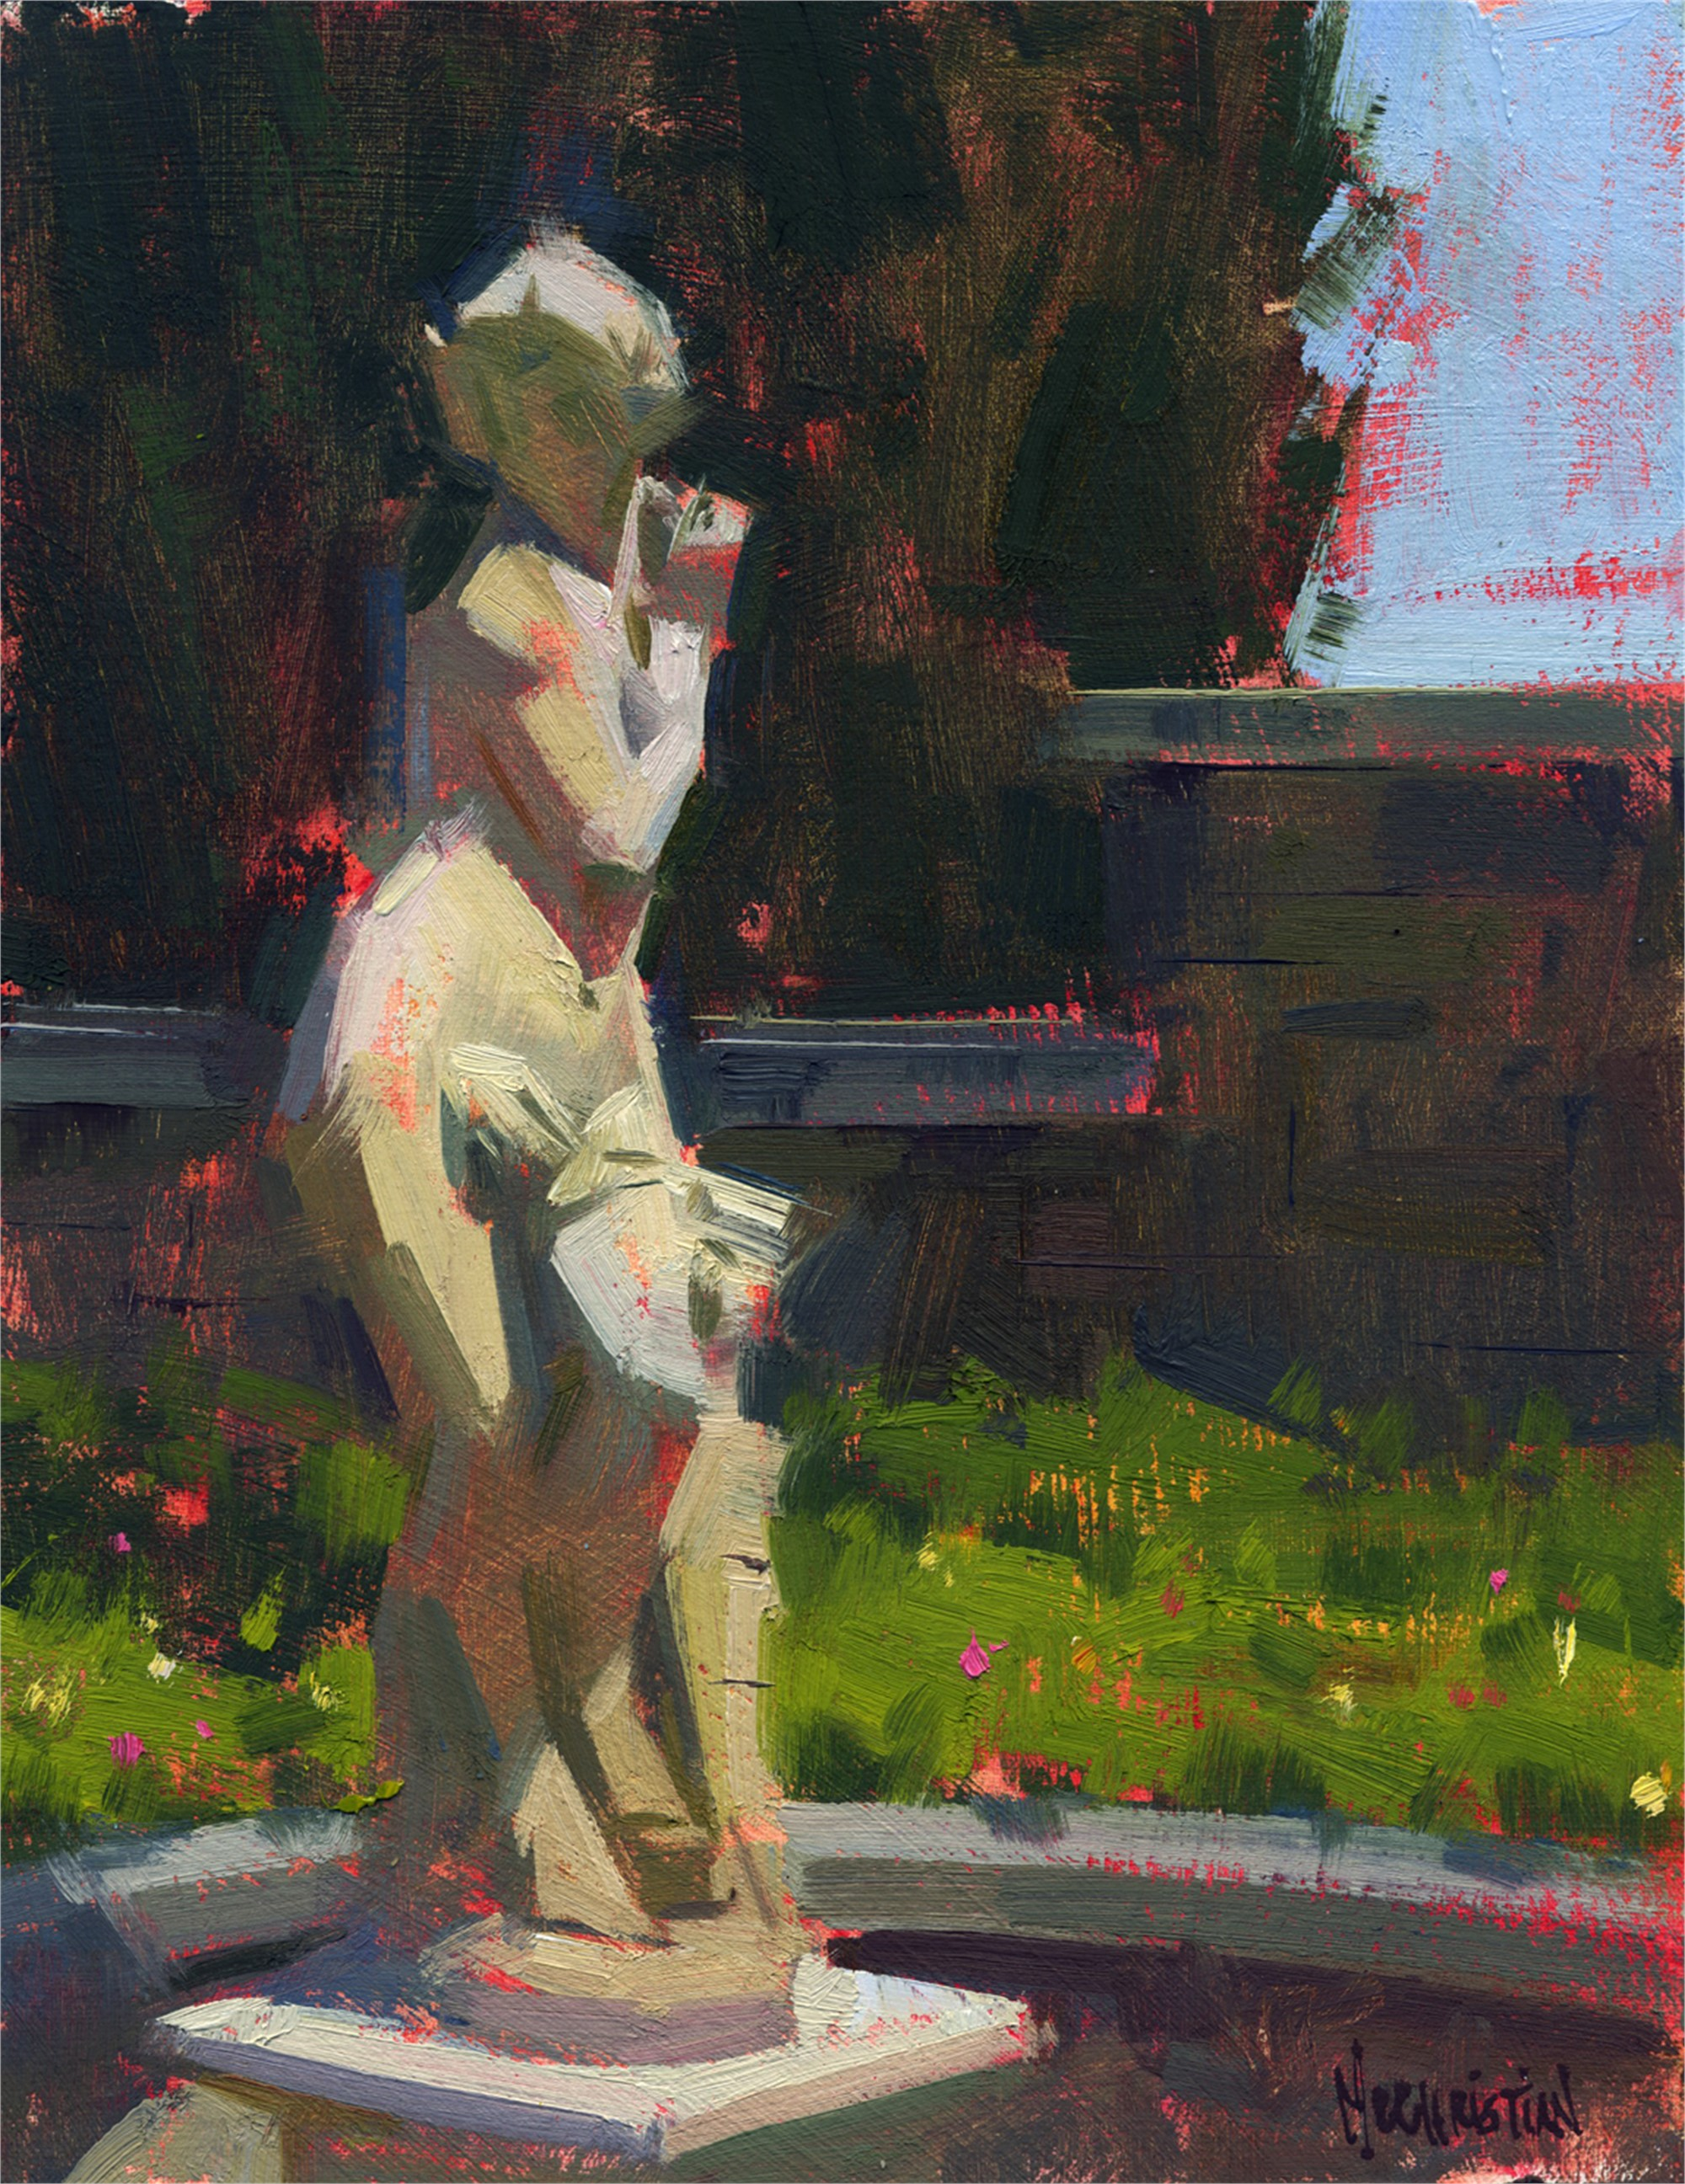 Demure Damsel by Jennifer McChristian